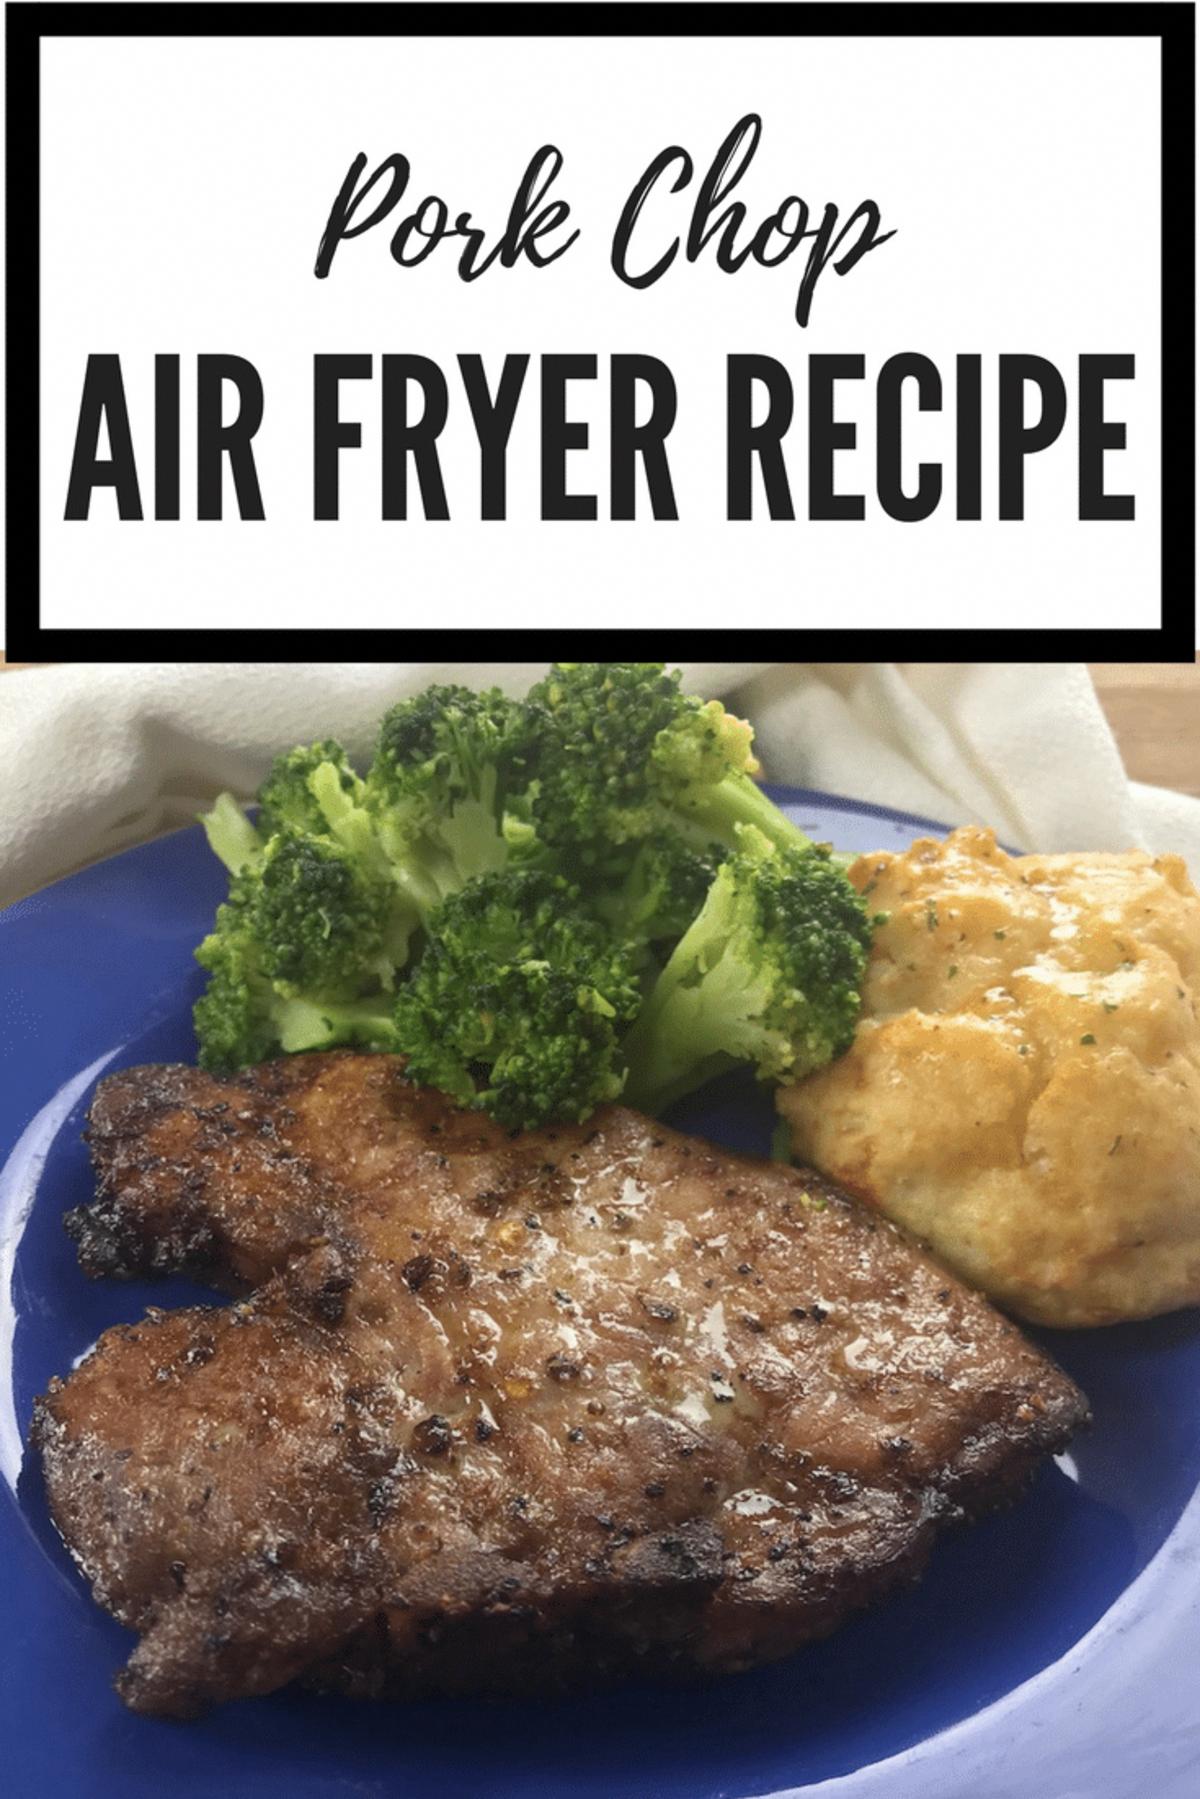 Pork Chop Air Fryer Recipe (Bonein or Boneless) Pork